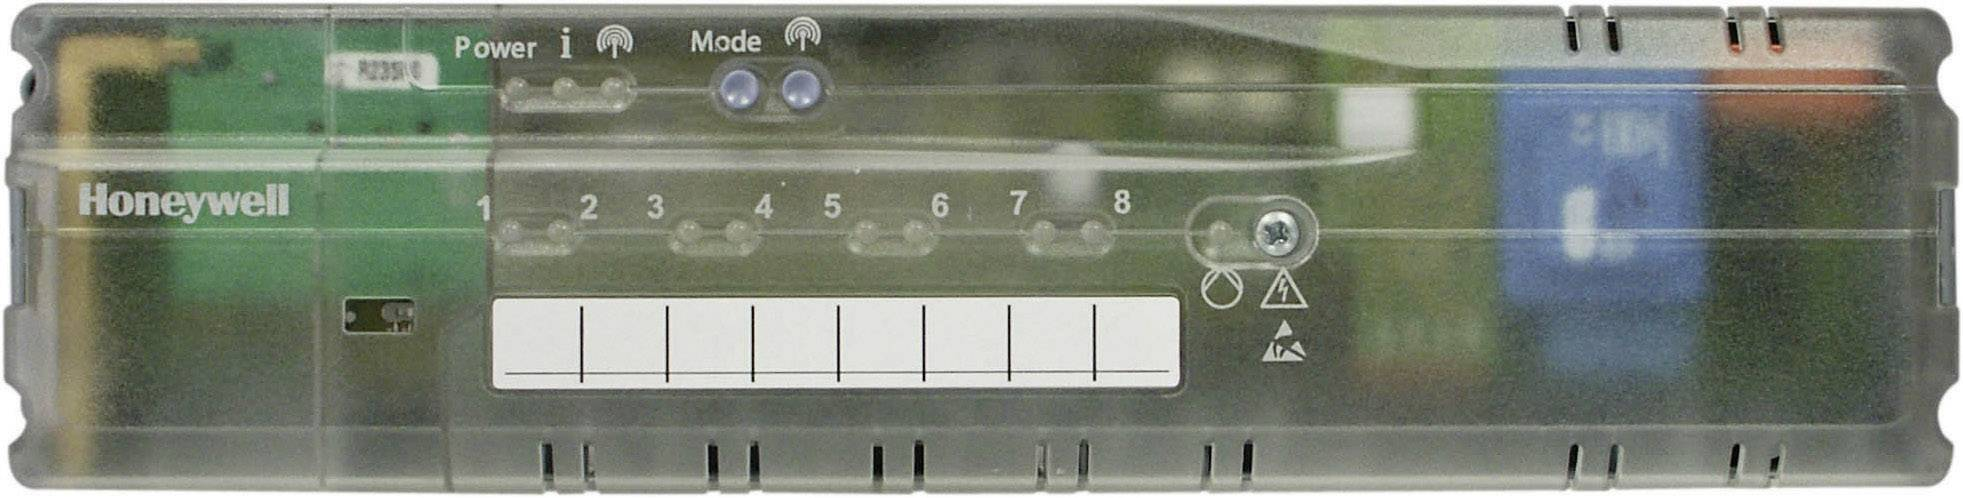 Podlahový termostat Honeywell Honeywell evohome HCE80